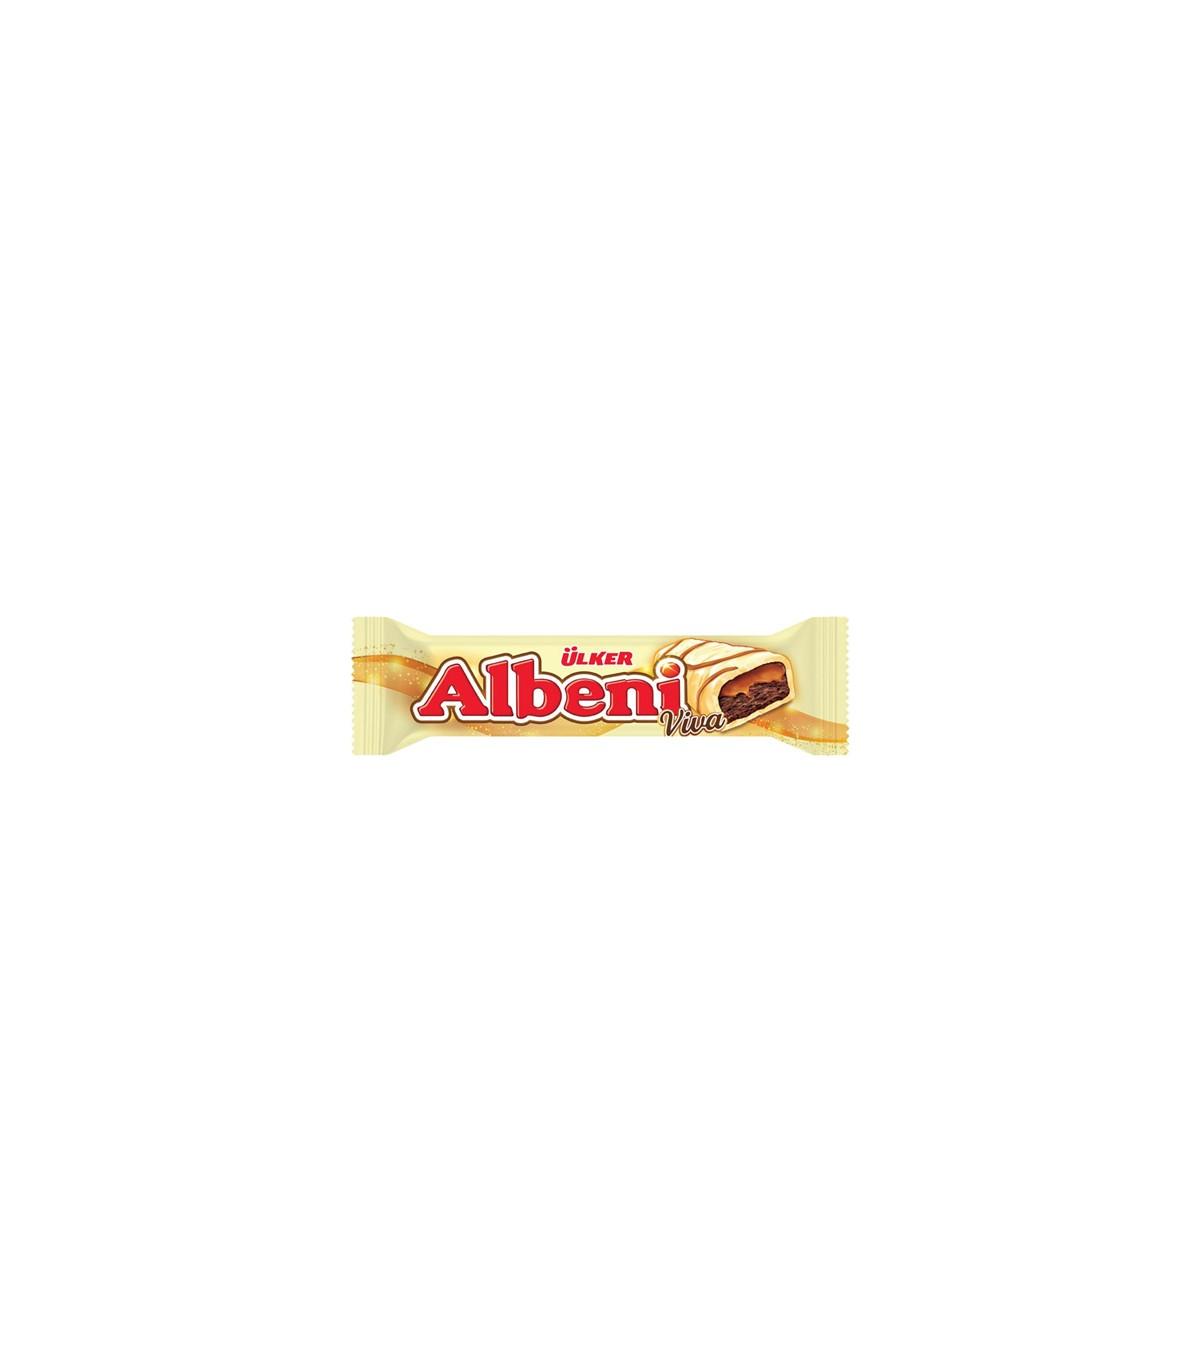 Albeni شکلات سفید 36 گرمی آلبنی